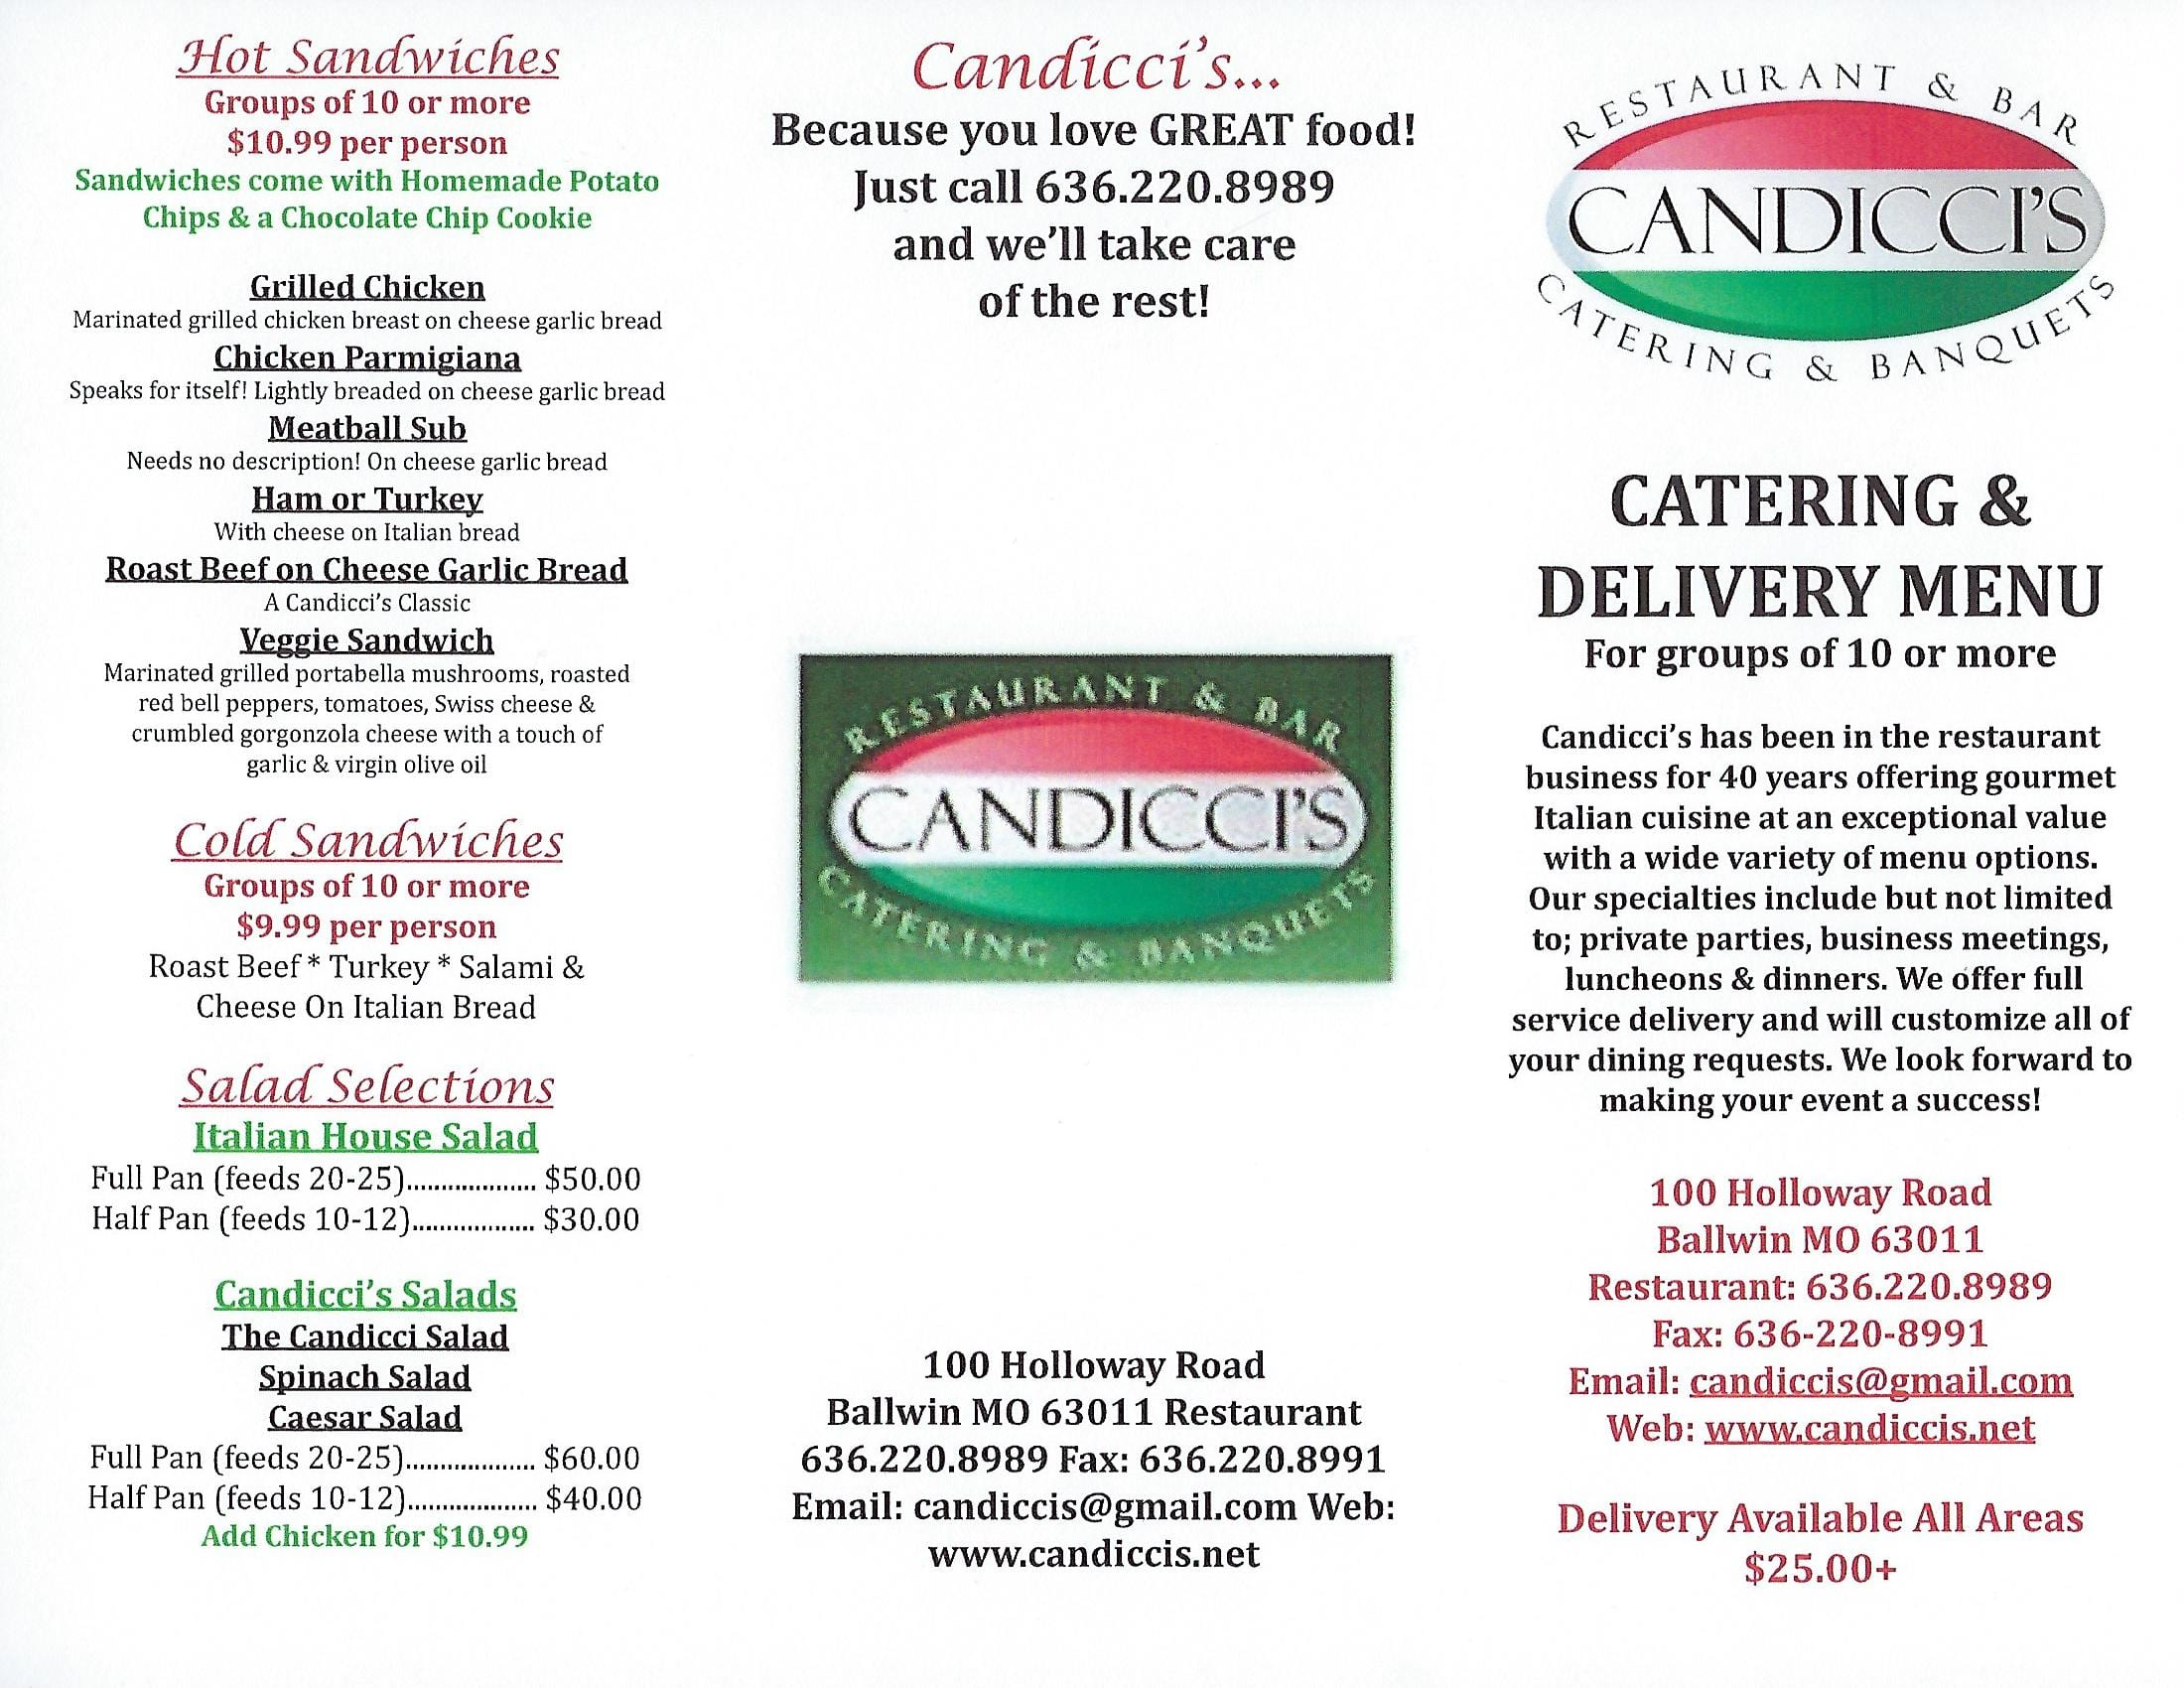 Candicci's Restaurant and Bar Catering Menu